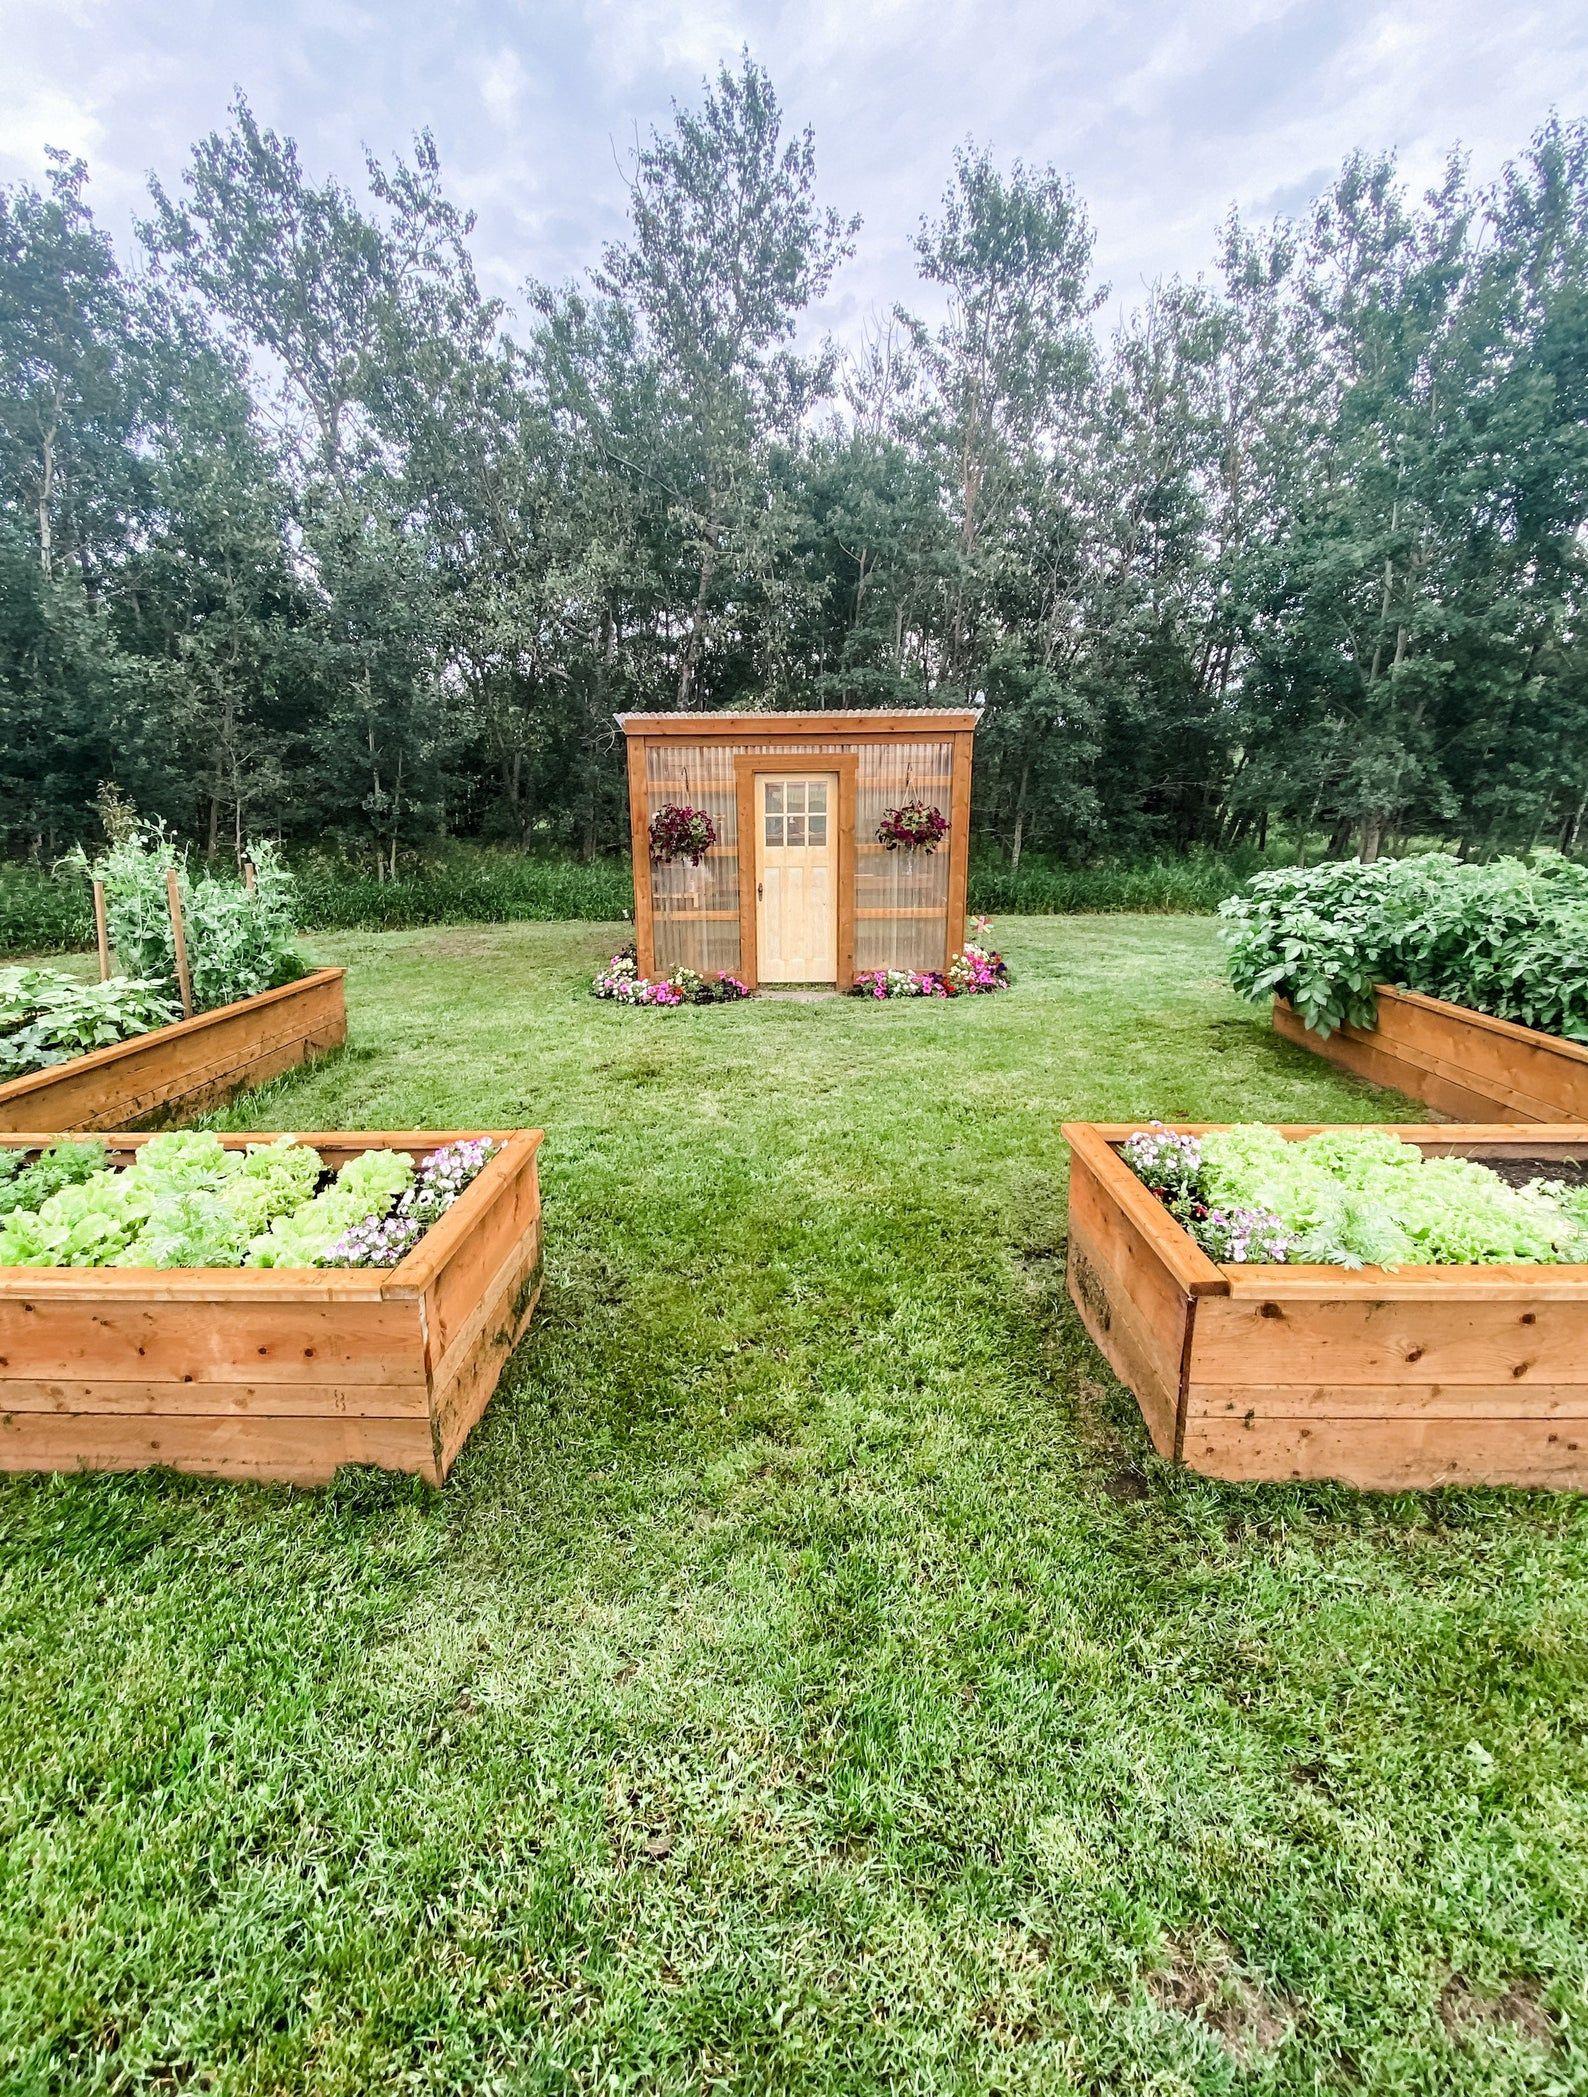 Diy 7x10 Lean To Greenhouse Building Guide In 2020 Lean To Greenhouse Backyard Greenhouse Farmhouse Landscaping Backyard garden kit jamaica